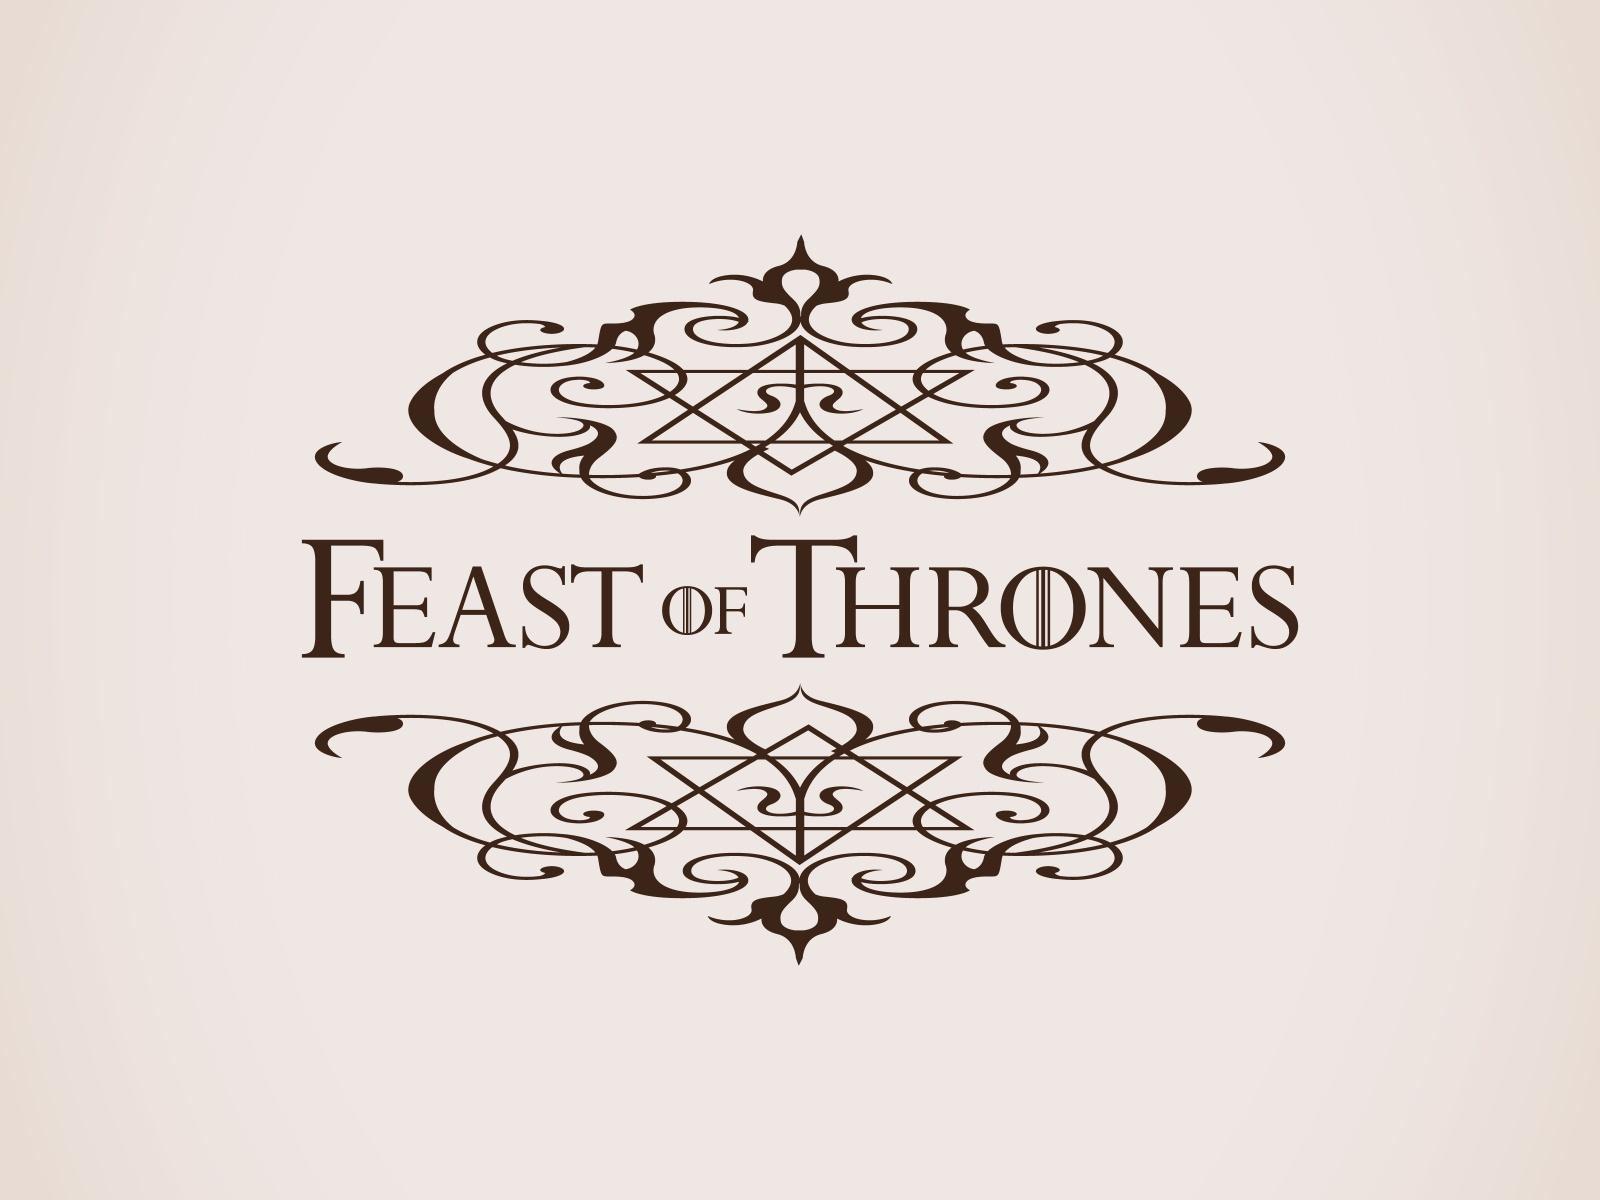 Feast of Thrones Event Mark